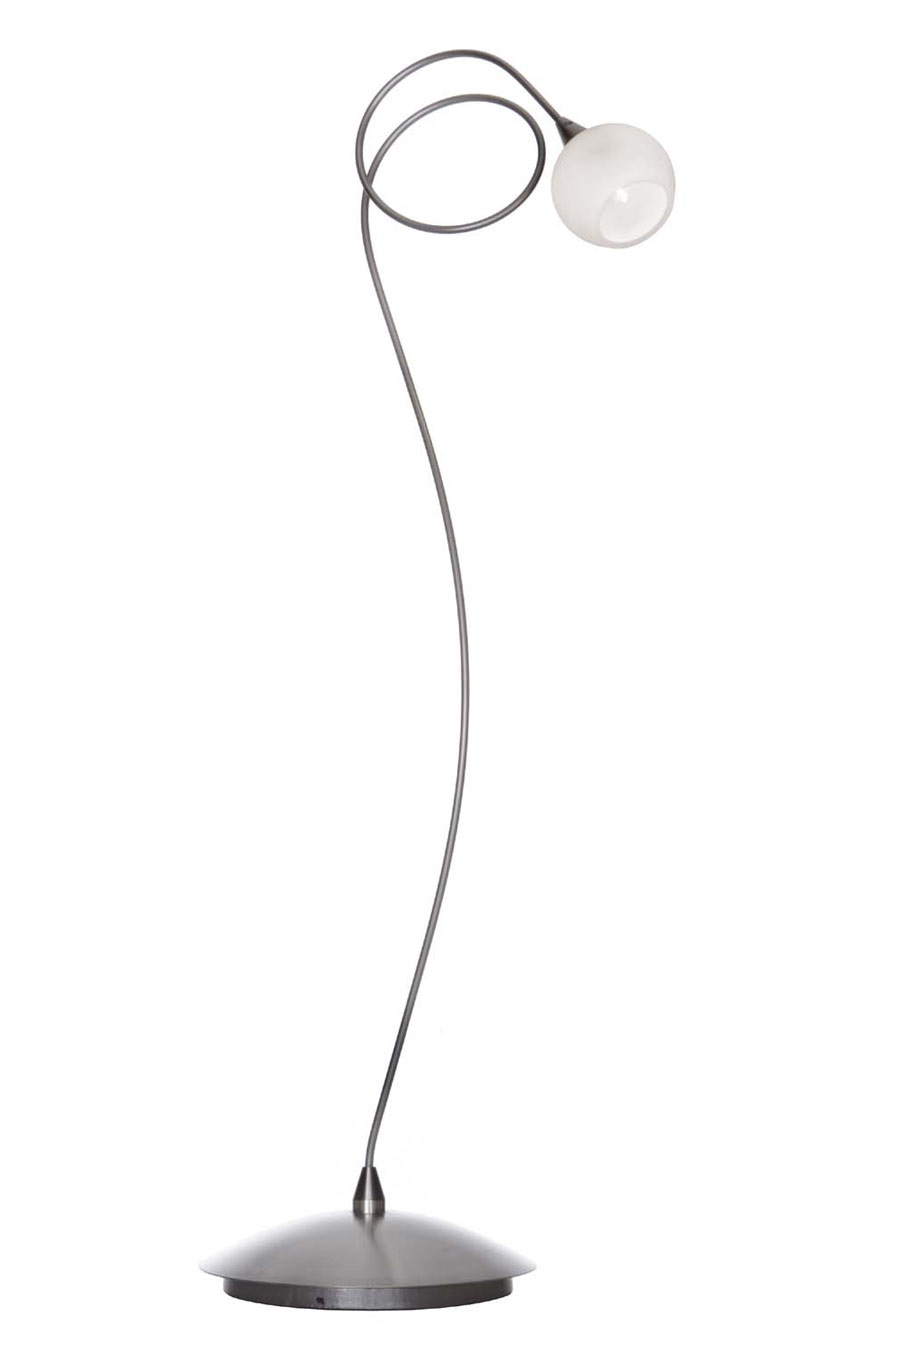 snowball lampe de table 1 lumi re boule blanche en verre harco loor luminaires en verre et. Black Bedroom Furniture Sets. Home Design Ideas